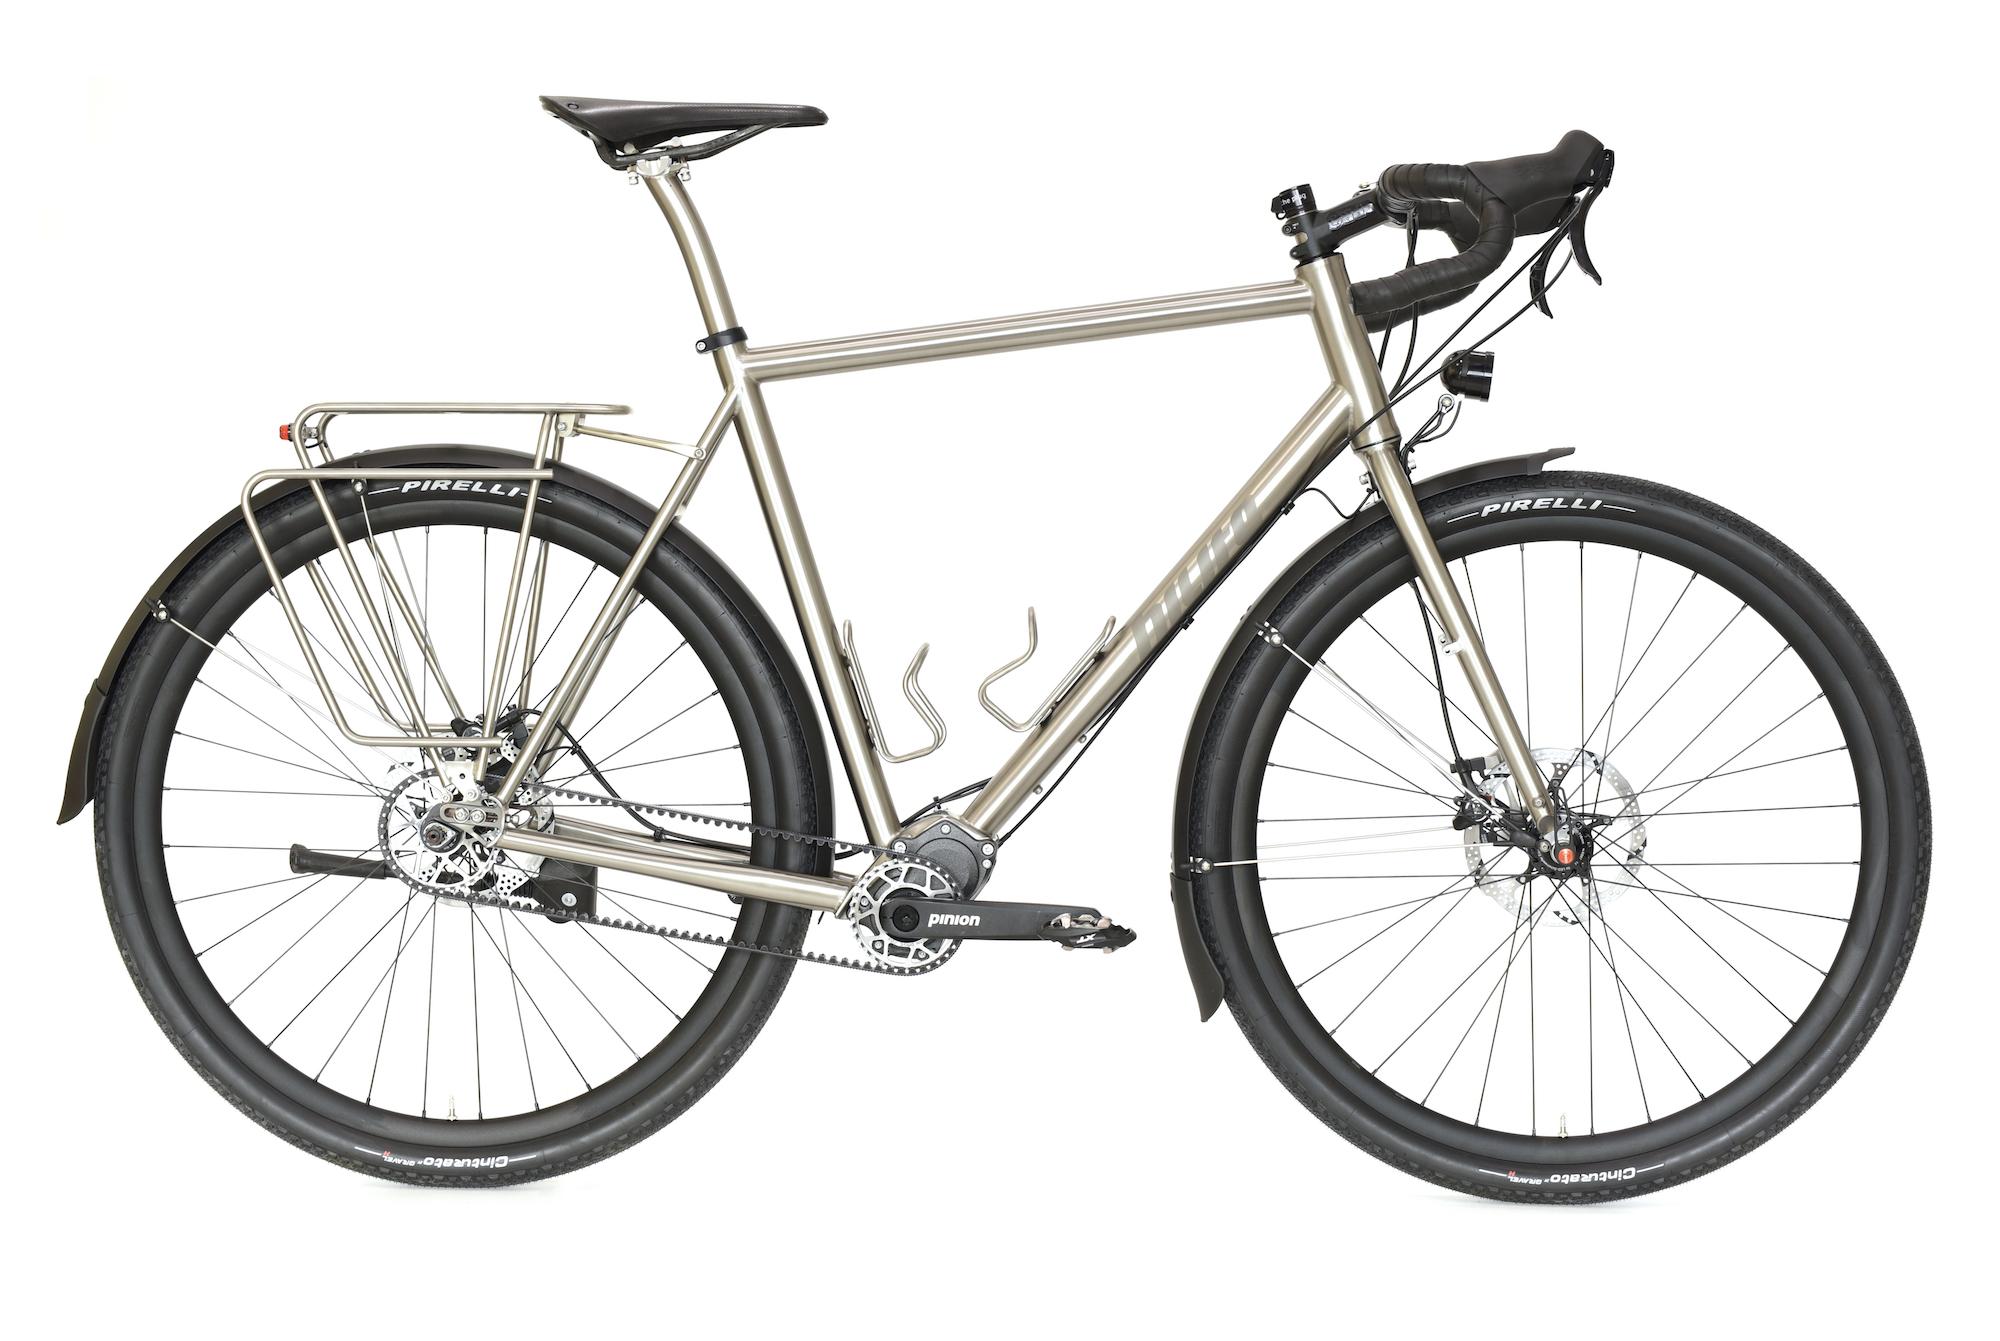 Adrian´s s Pinion Gravel Allroad Titan Bike 1